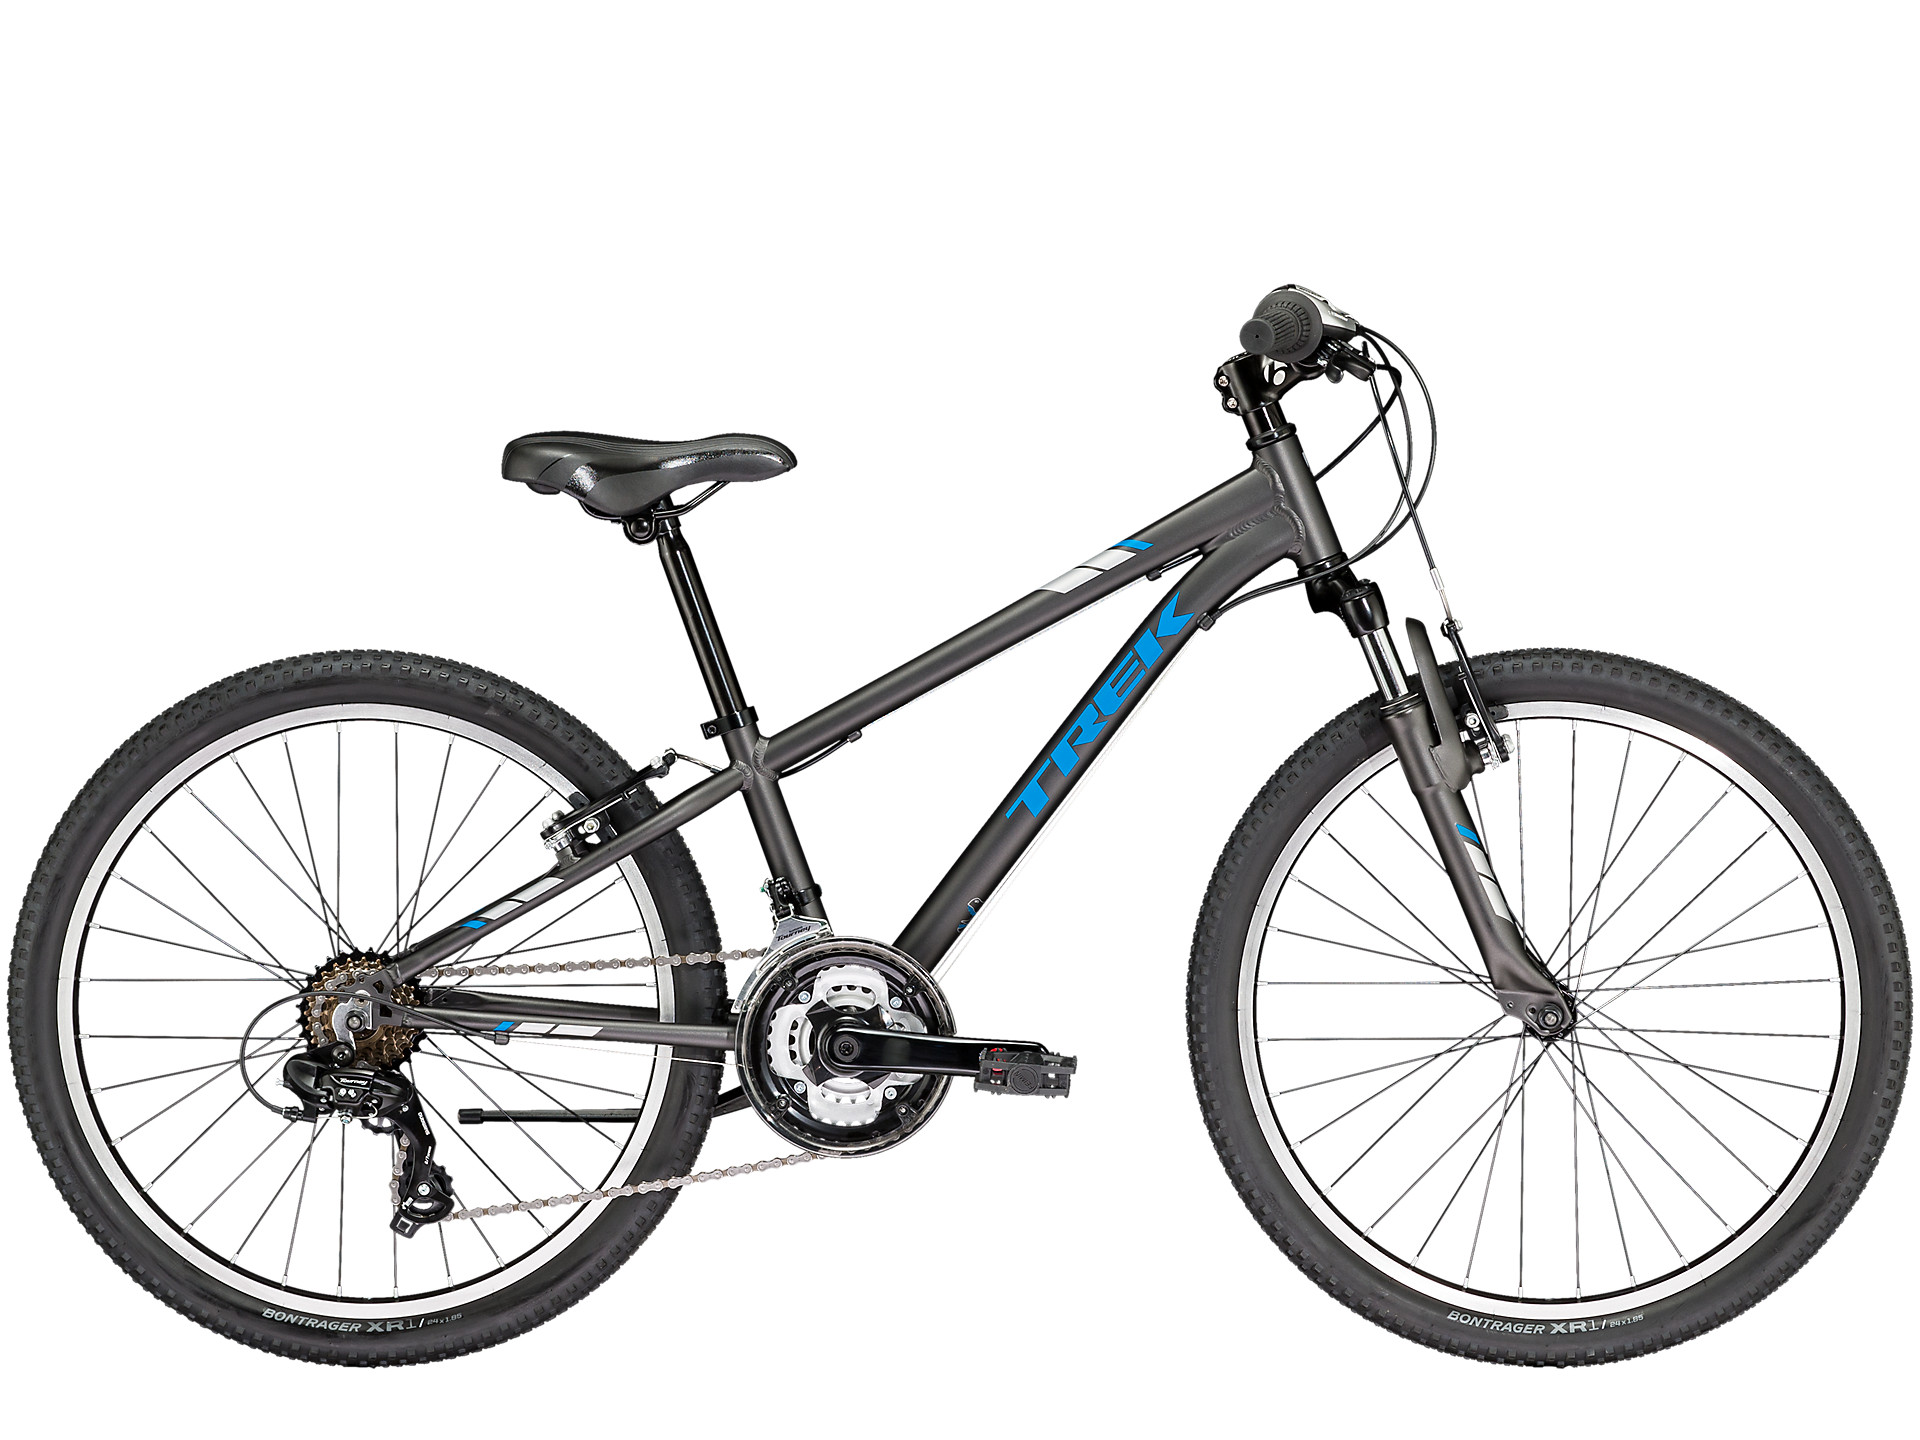 0a61638dd84 Precaliber 24 21-speed Boy's | Trek Bikes (CA)